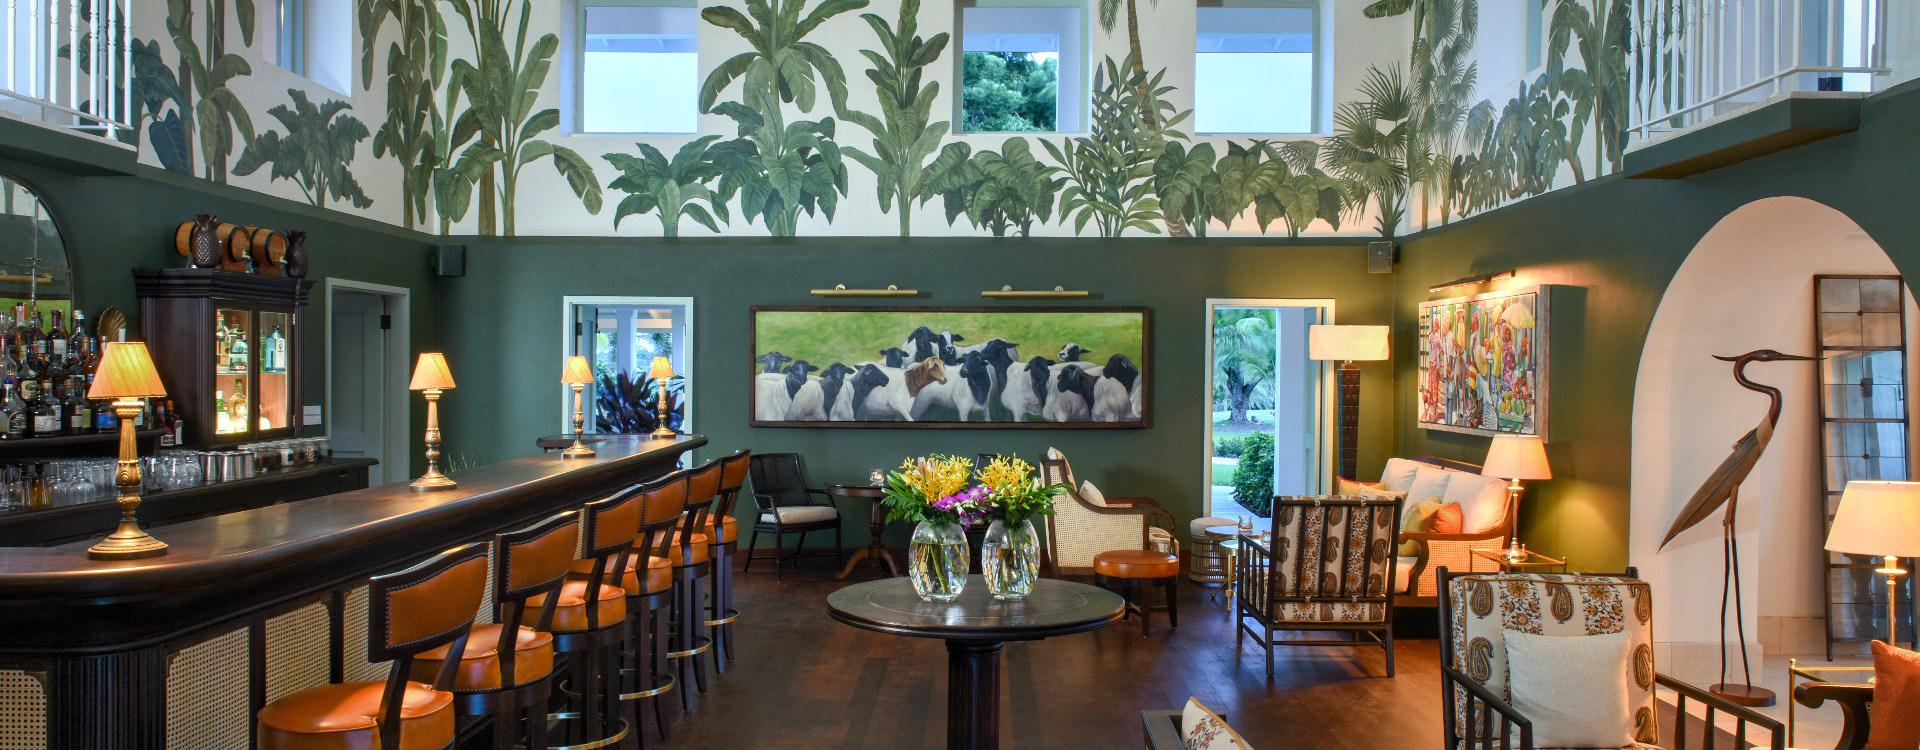 1830 Bar Antigua Jumby Bay Island Luxury Resort